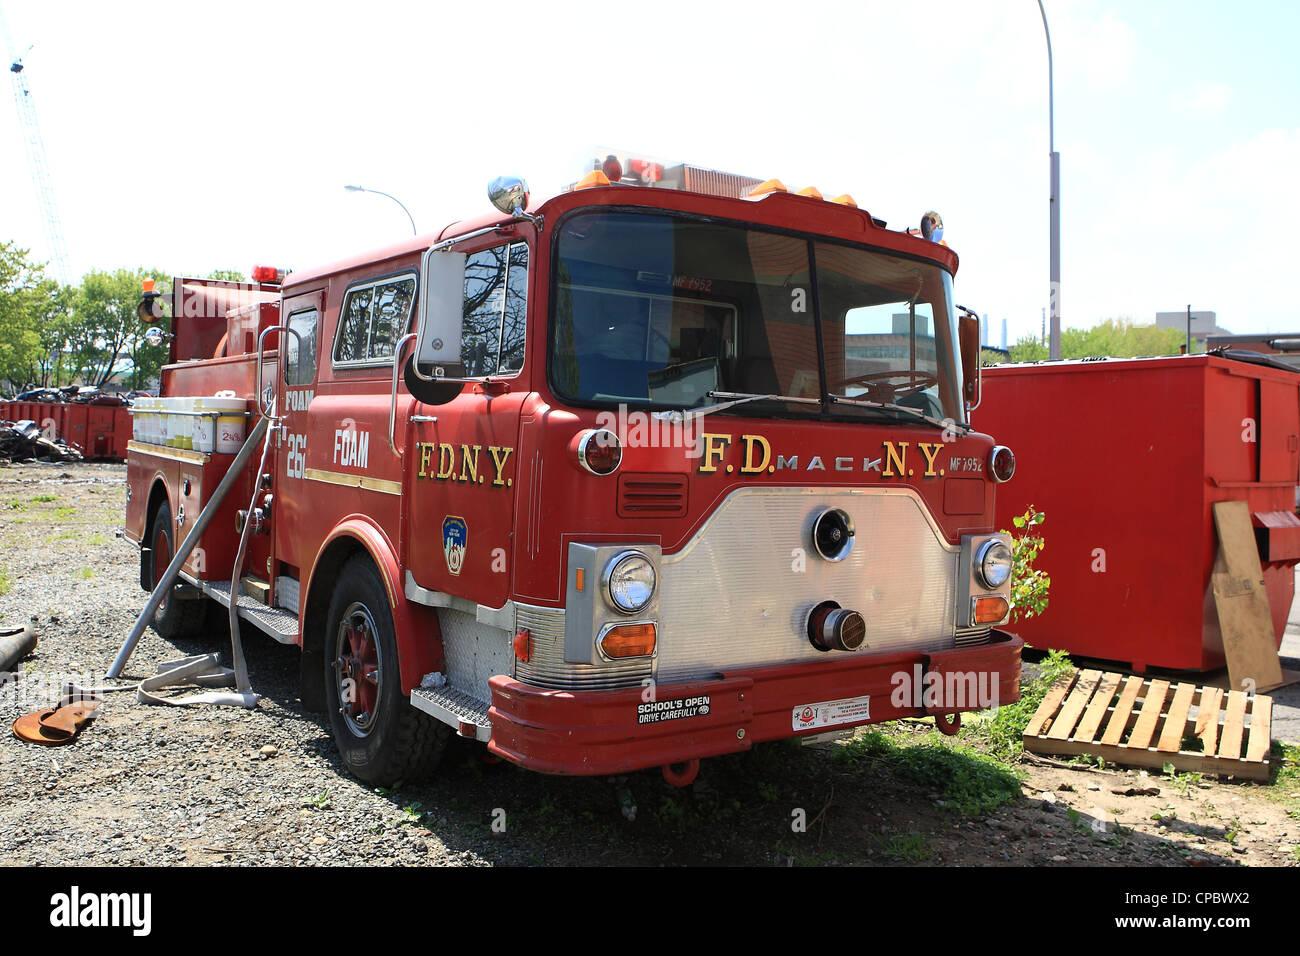 Old Mack Fire Trucks : Fdny old mack fire truck foam unit stock photo royalty